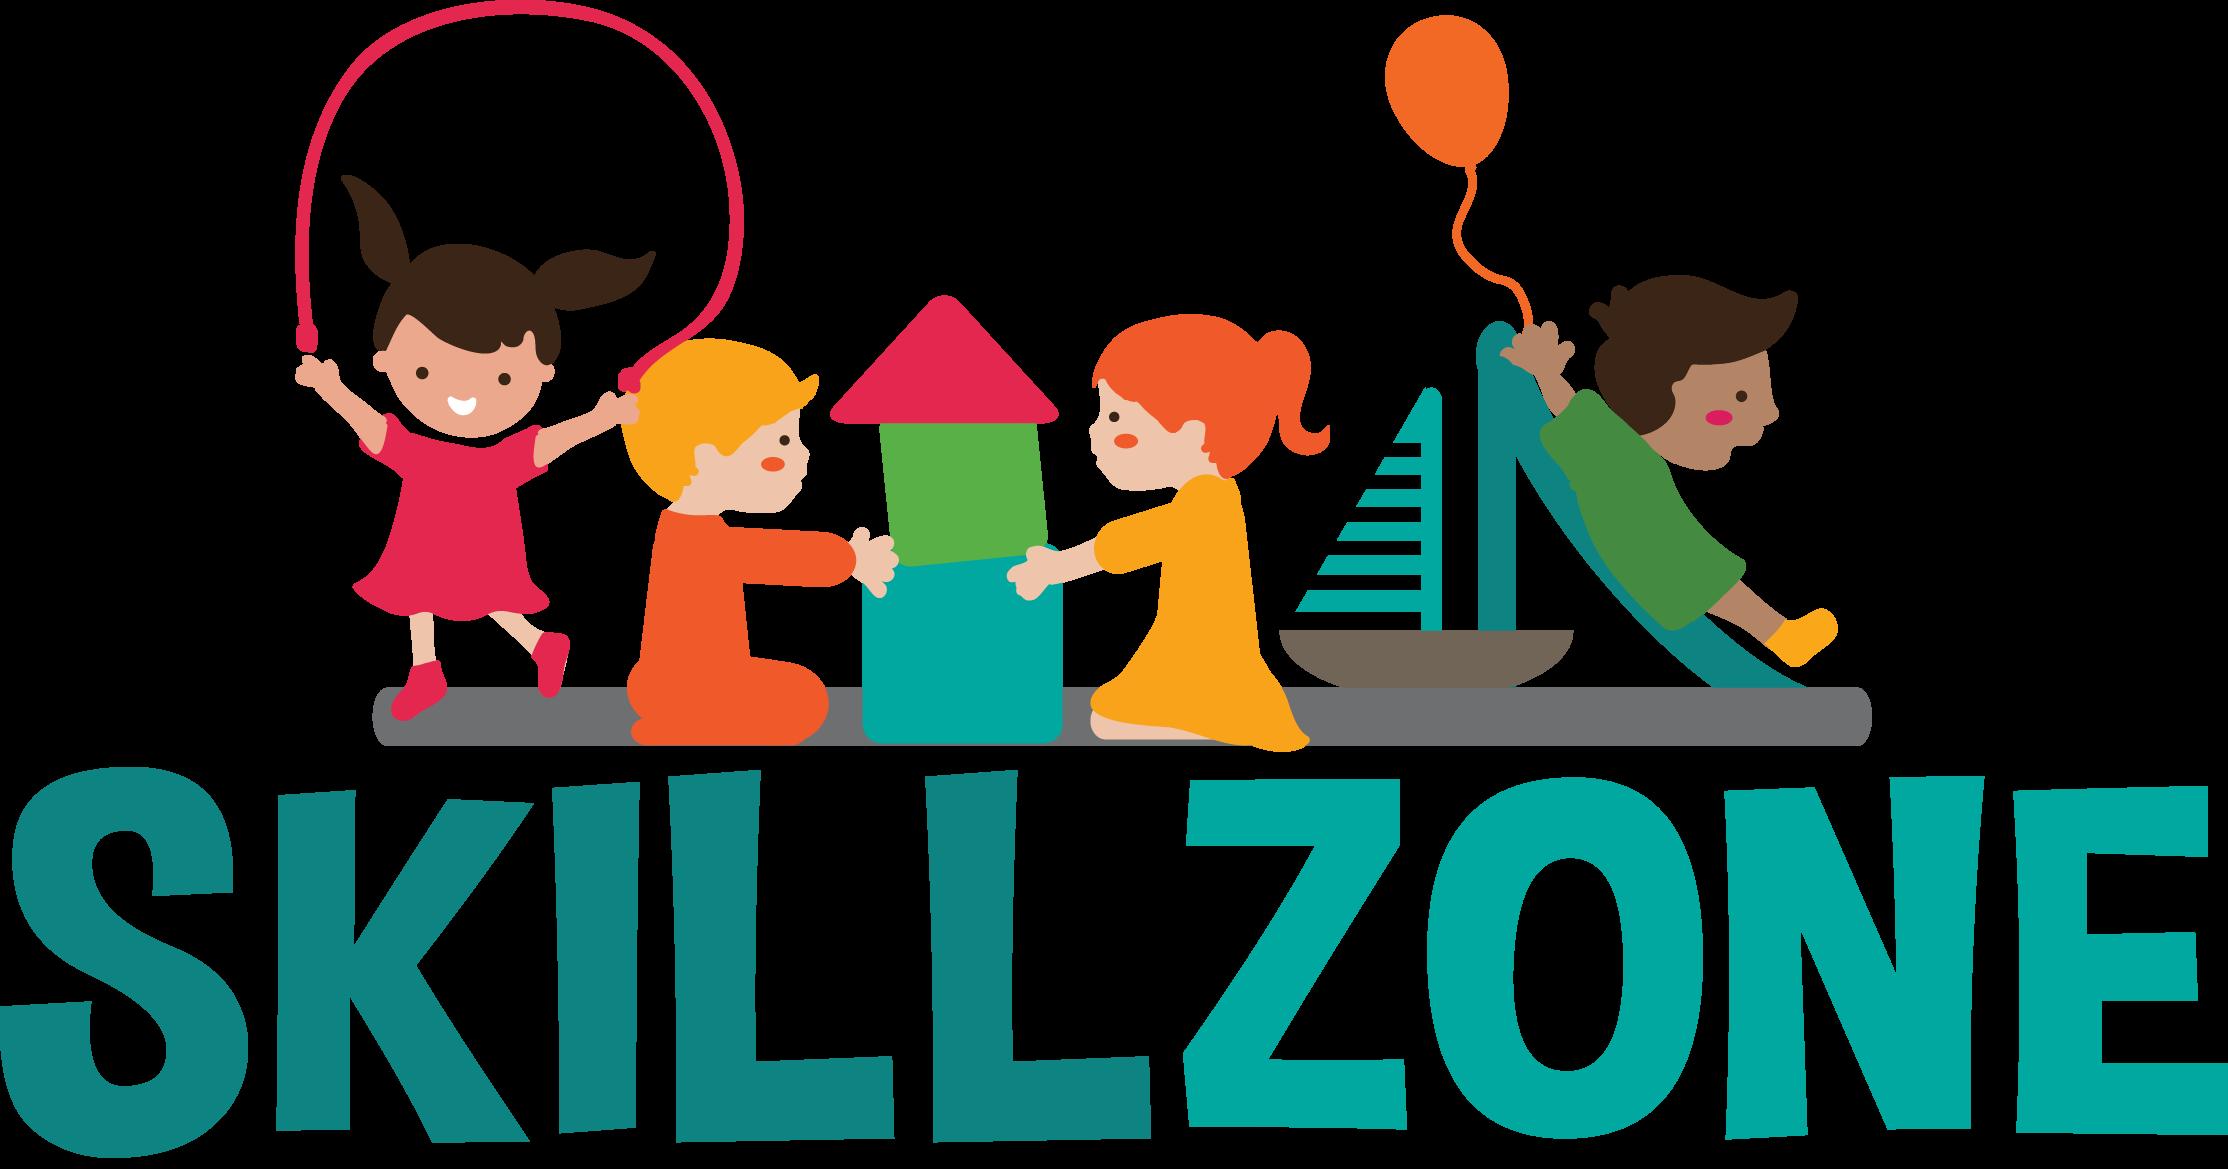 SkillZone logo.png